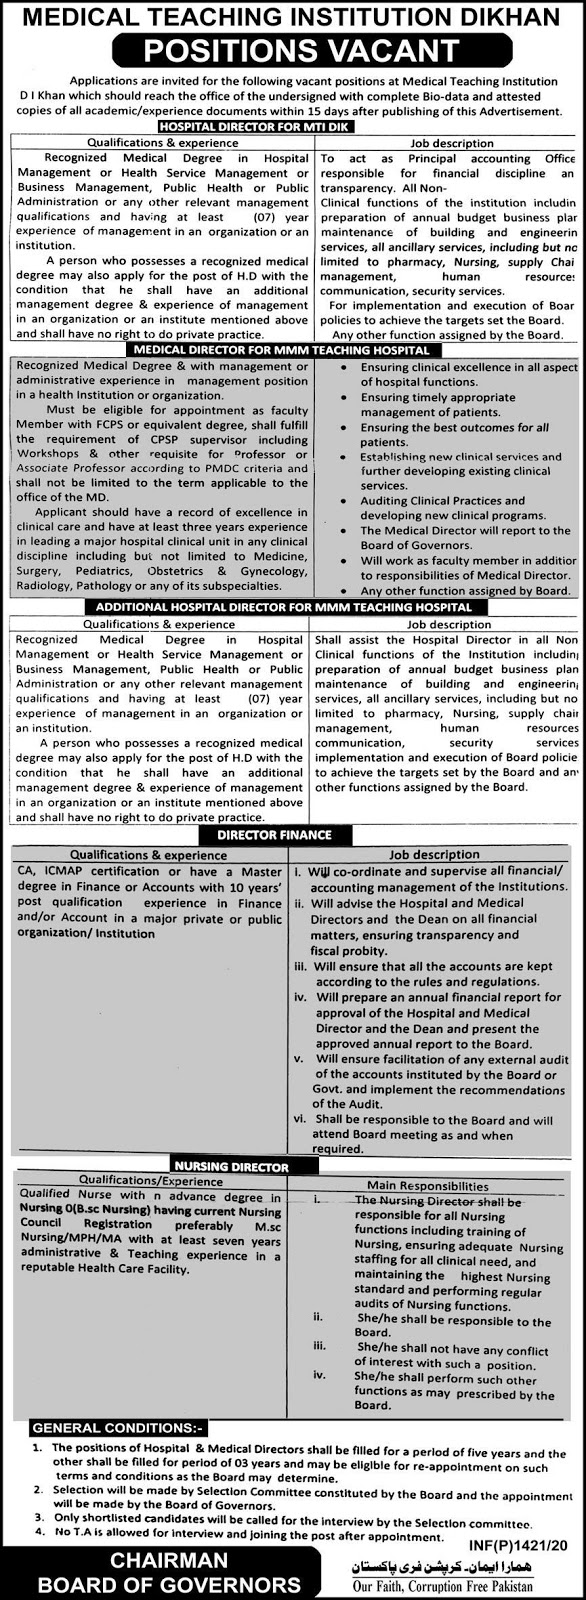 Medical Teaching Institution DI Khan Jobs 2020